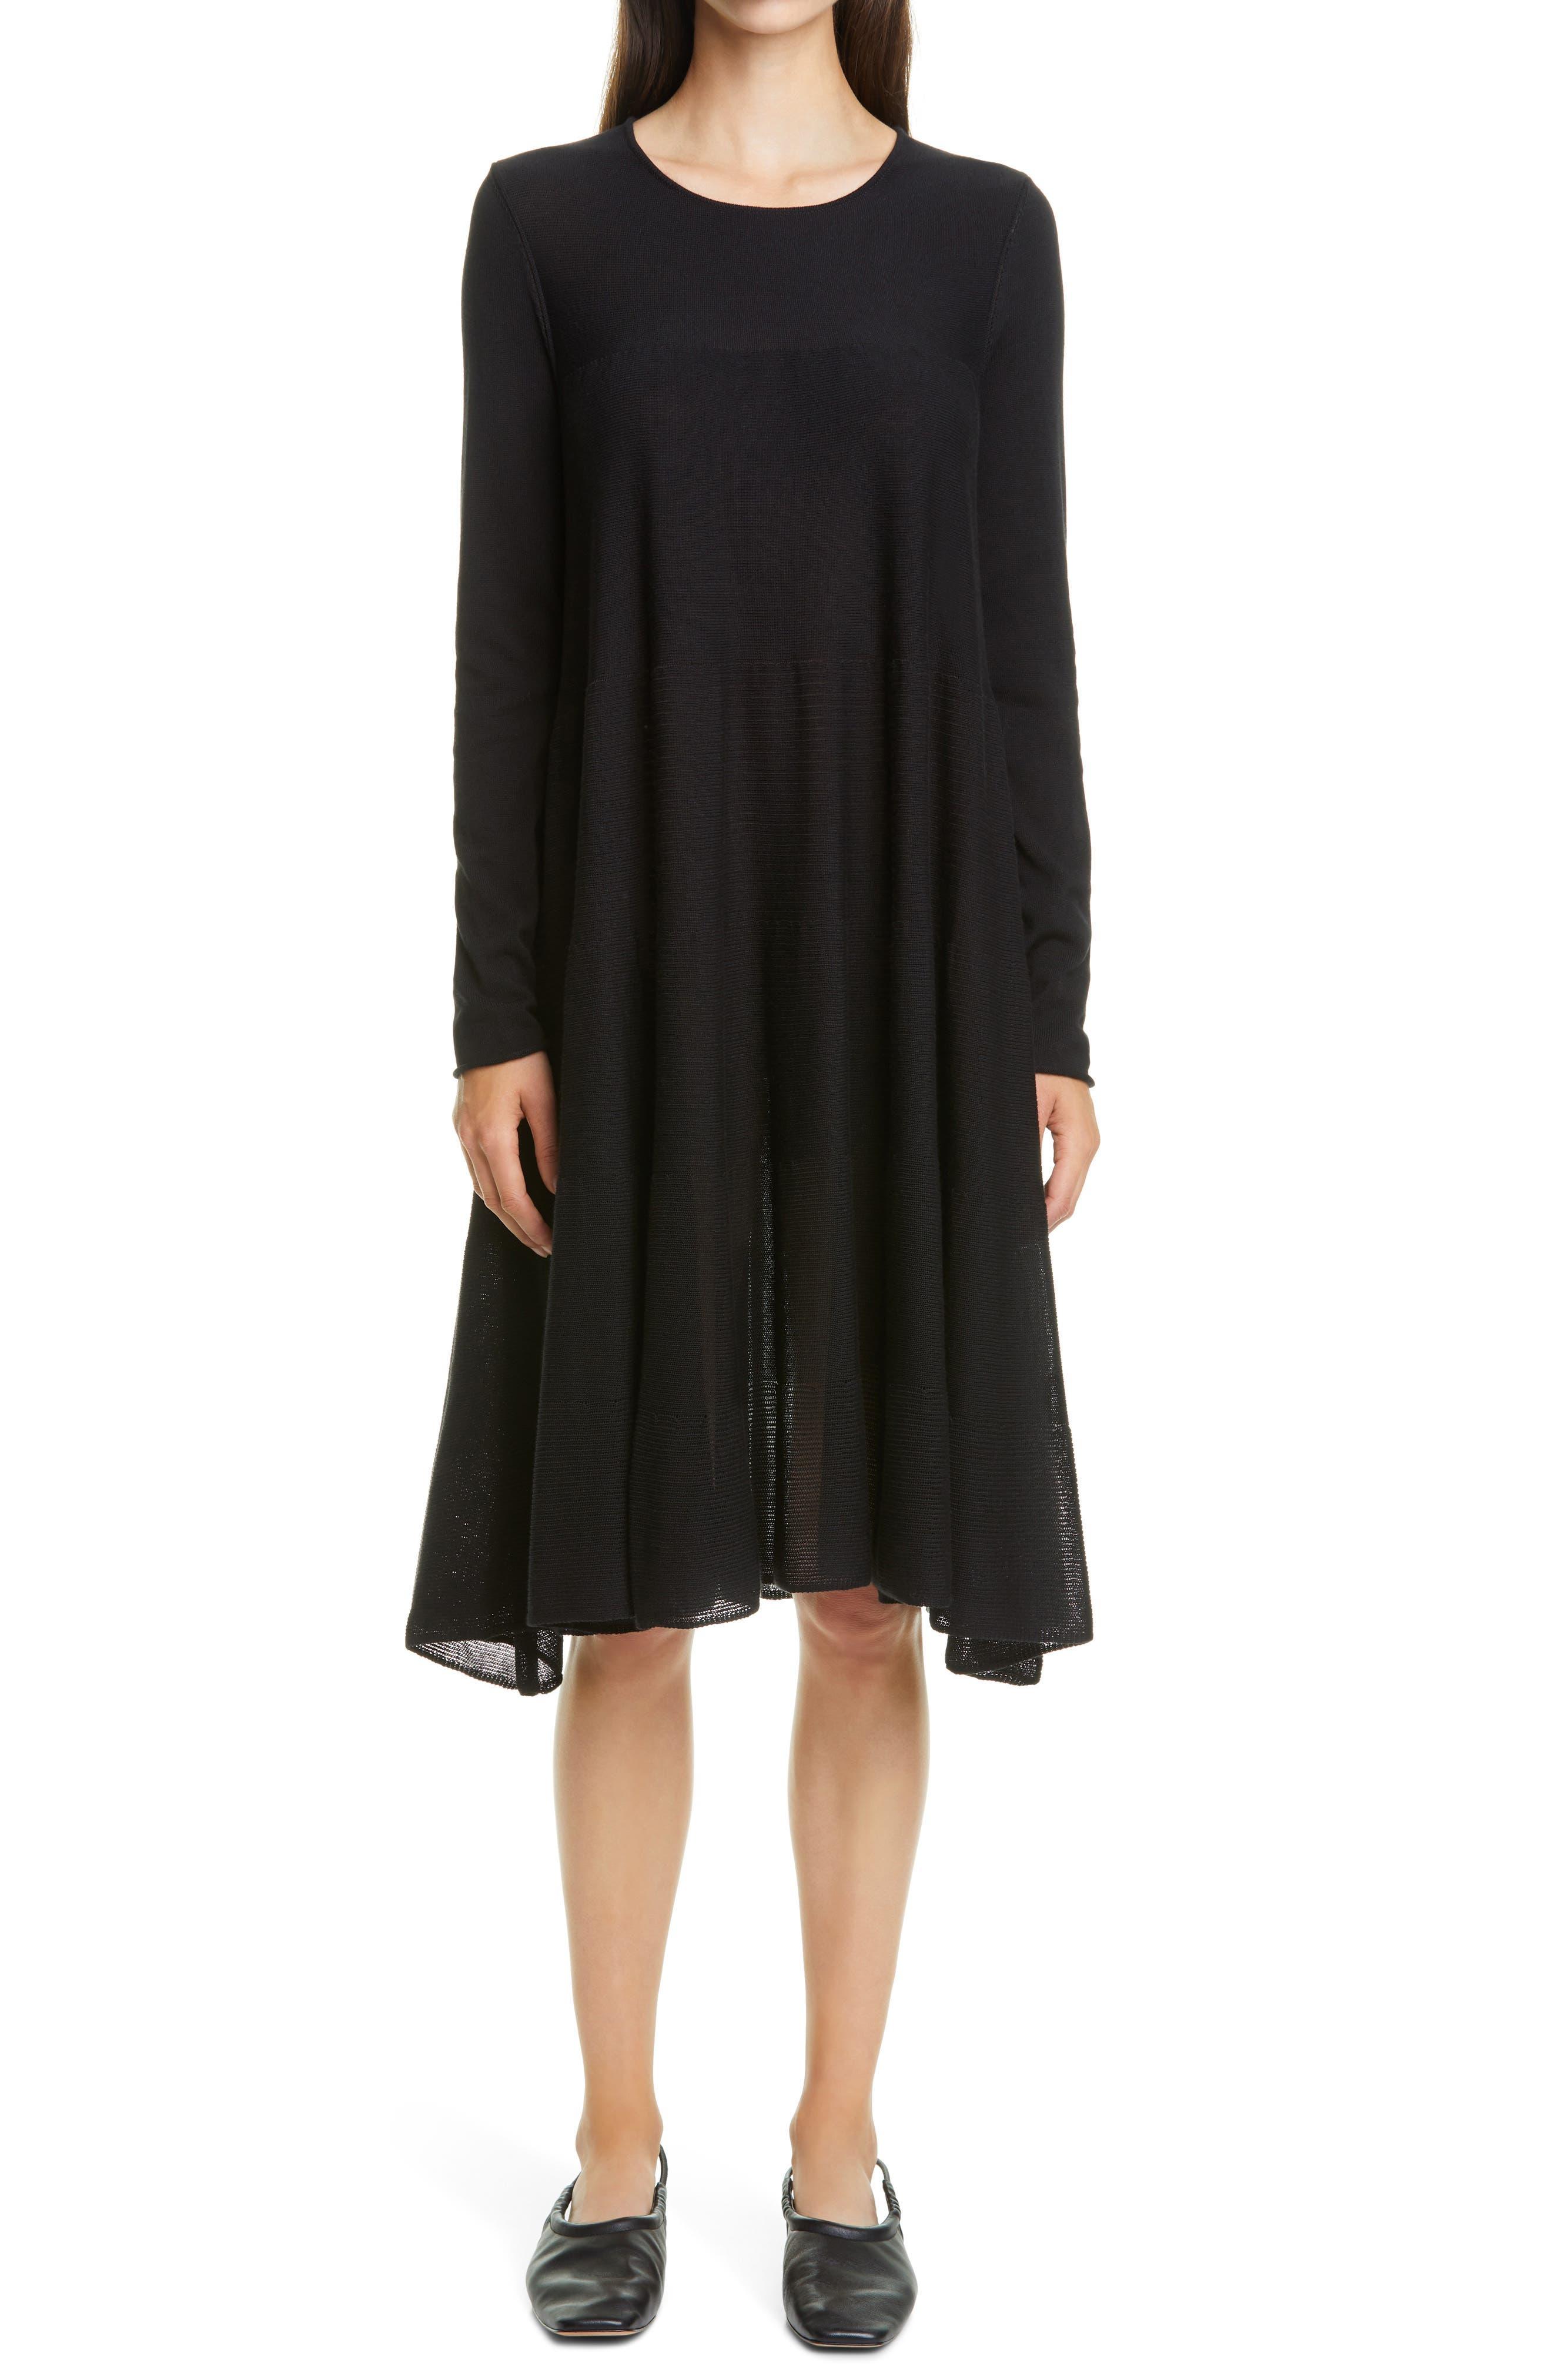 Addison Rib Detail Long Sleeve Dress